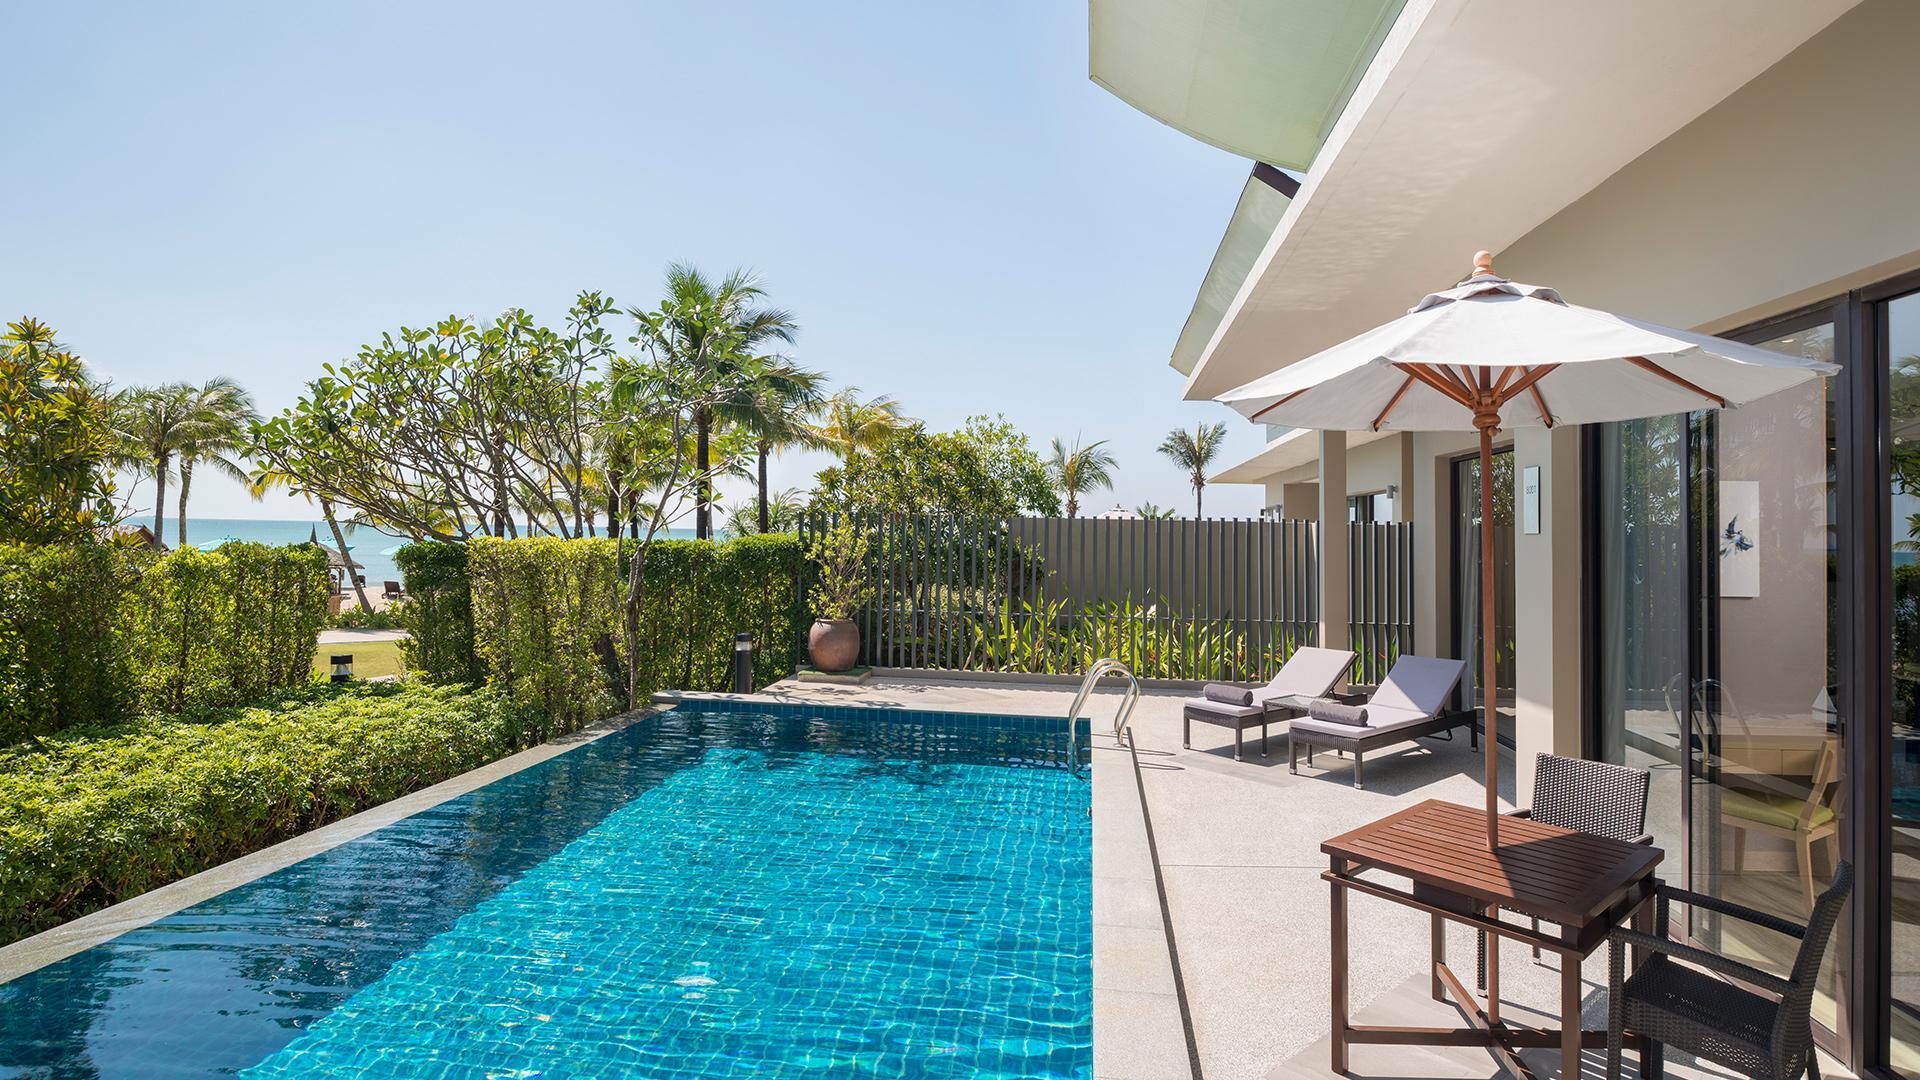 Pool Villa image 1 at Le Méridien Khao Lak Resort & Spa by Amphoe Takua Pa, Chang Wat Phang-nga, Thailand